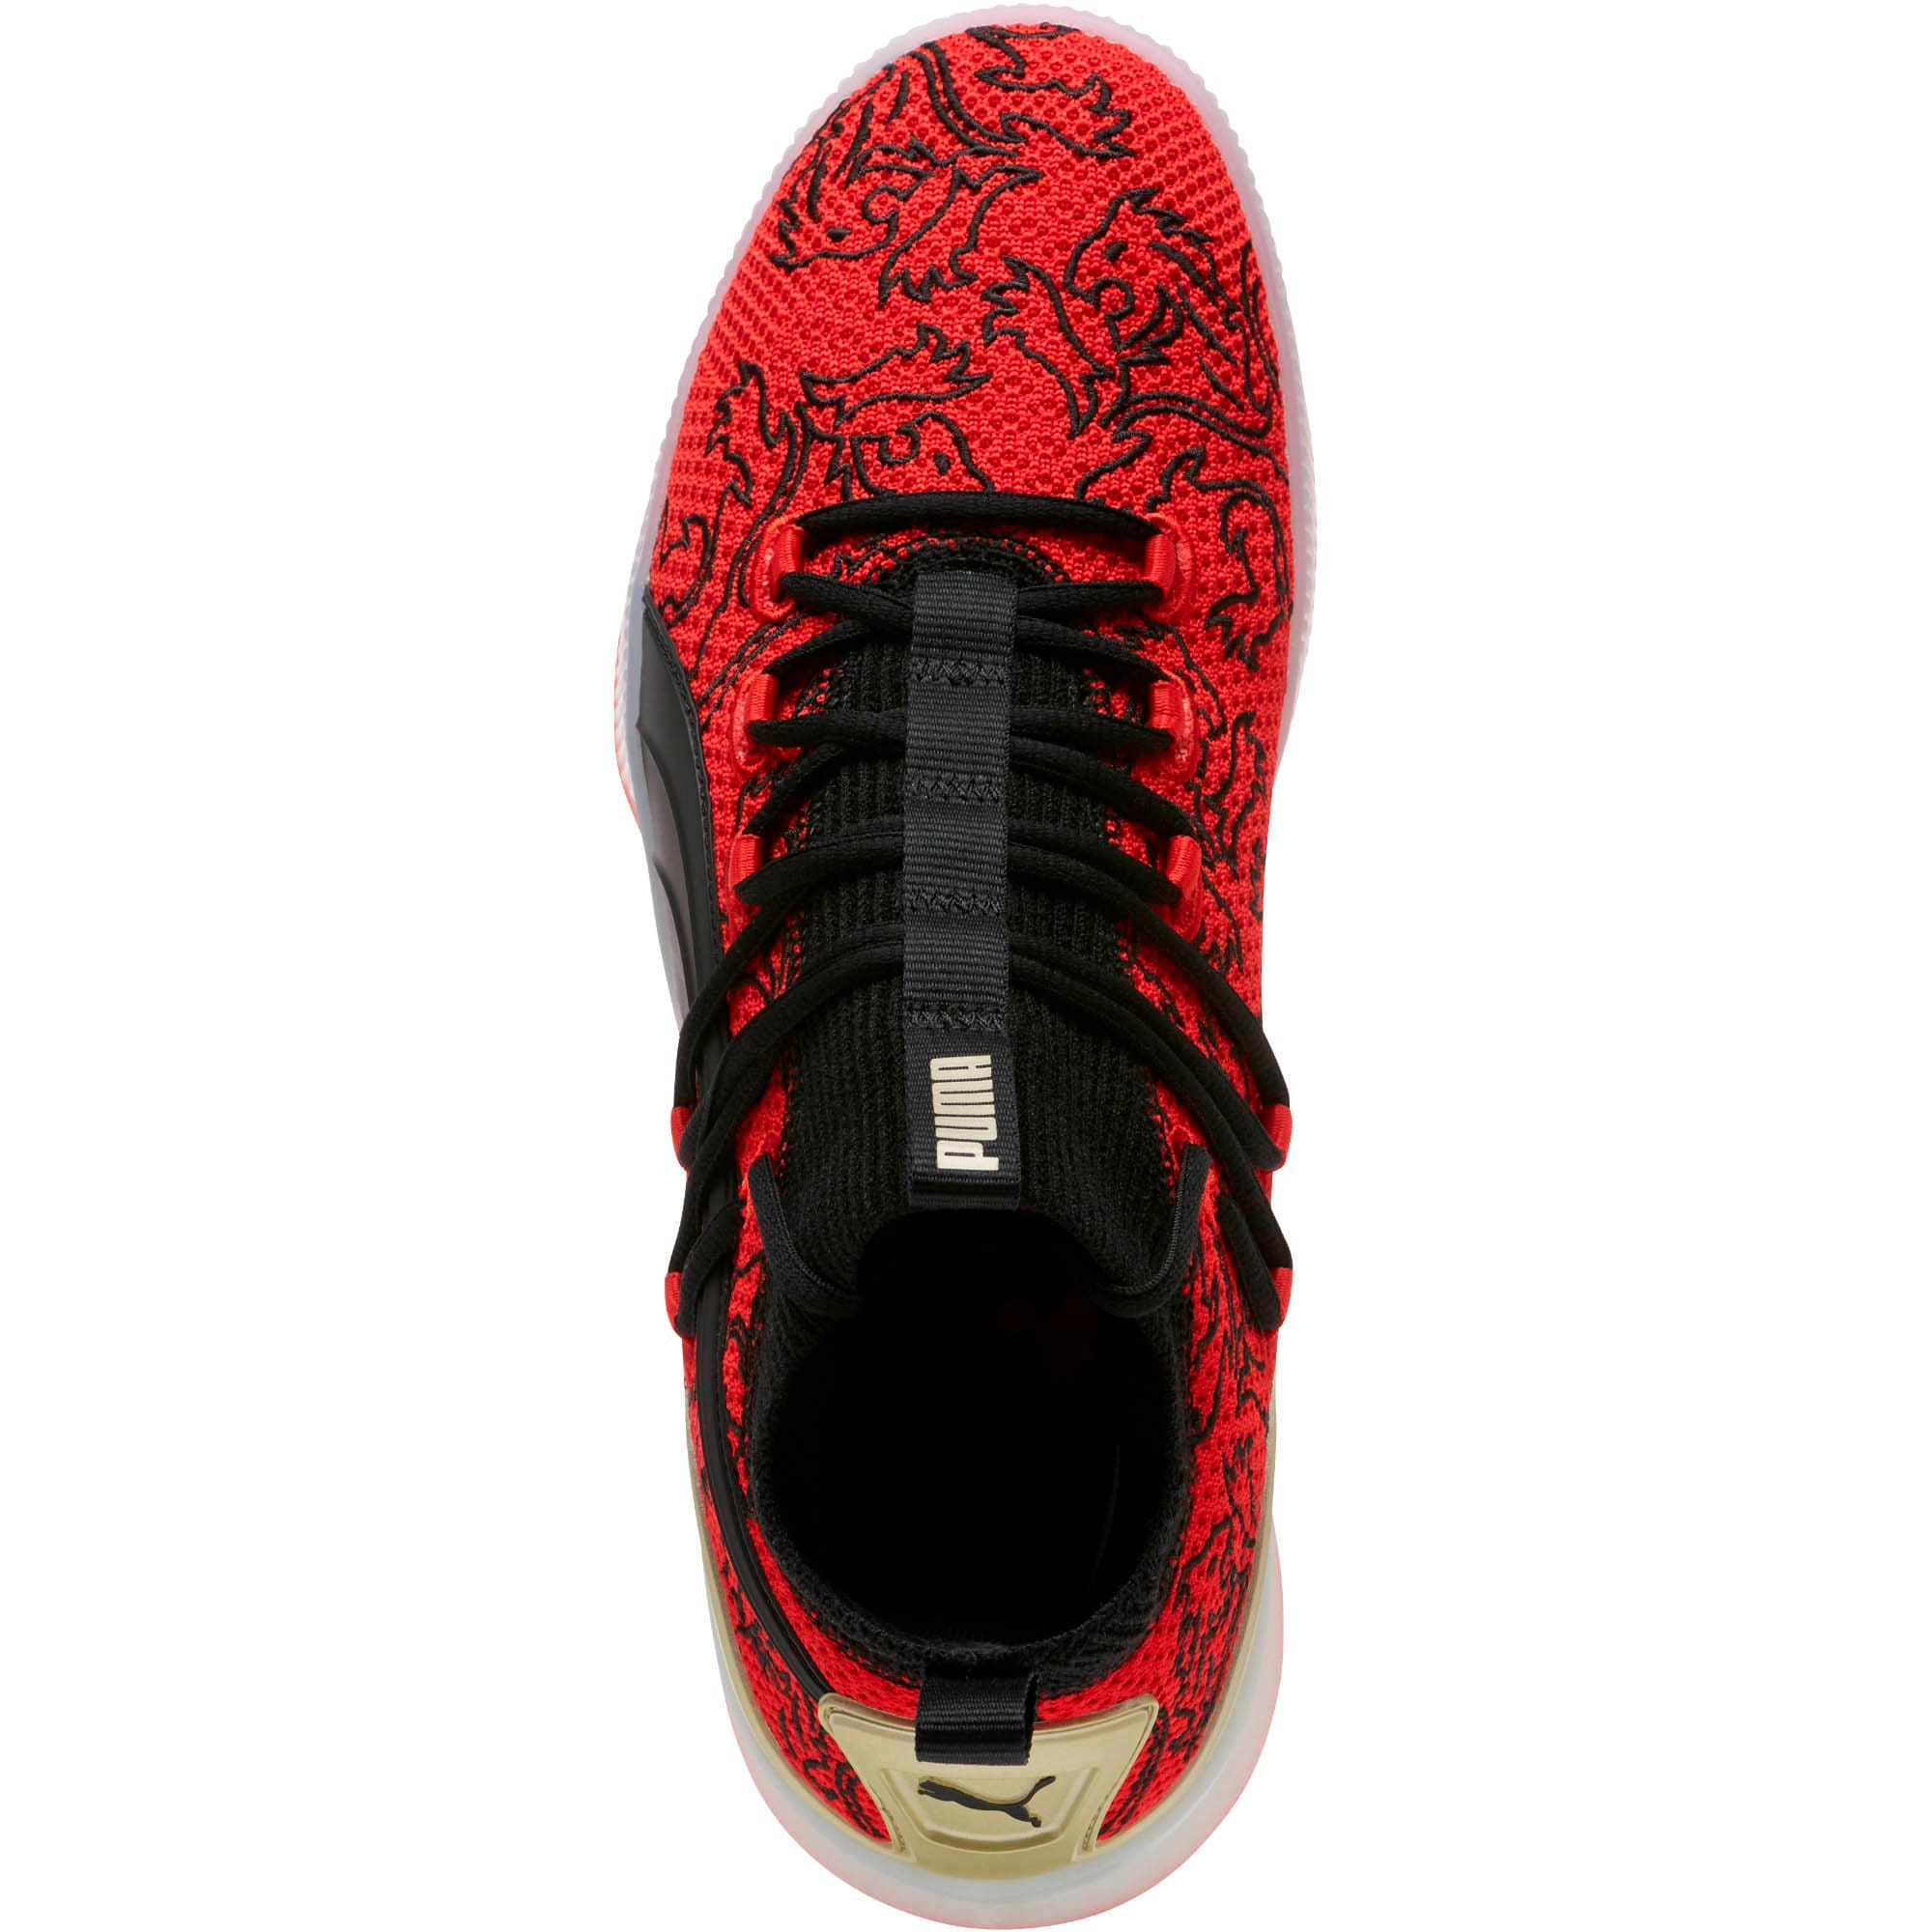 Imagen en miniatura 5 de Zapatillas de baloncesto de hombre Clyde Court London, High Risk Red-Puma Black, mediana